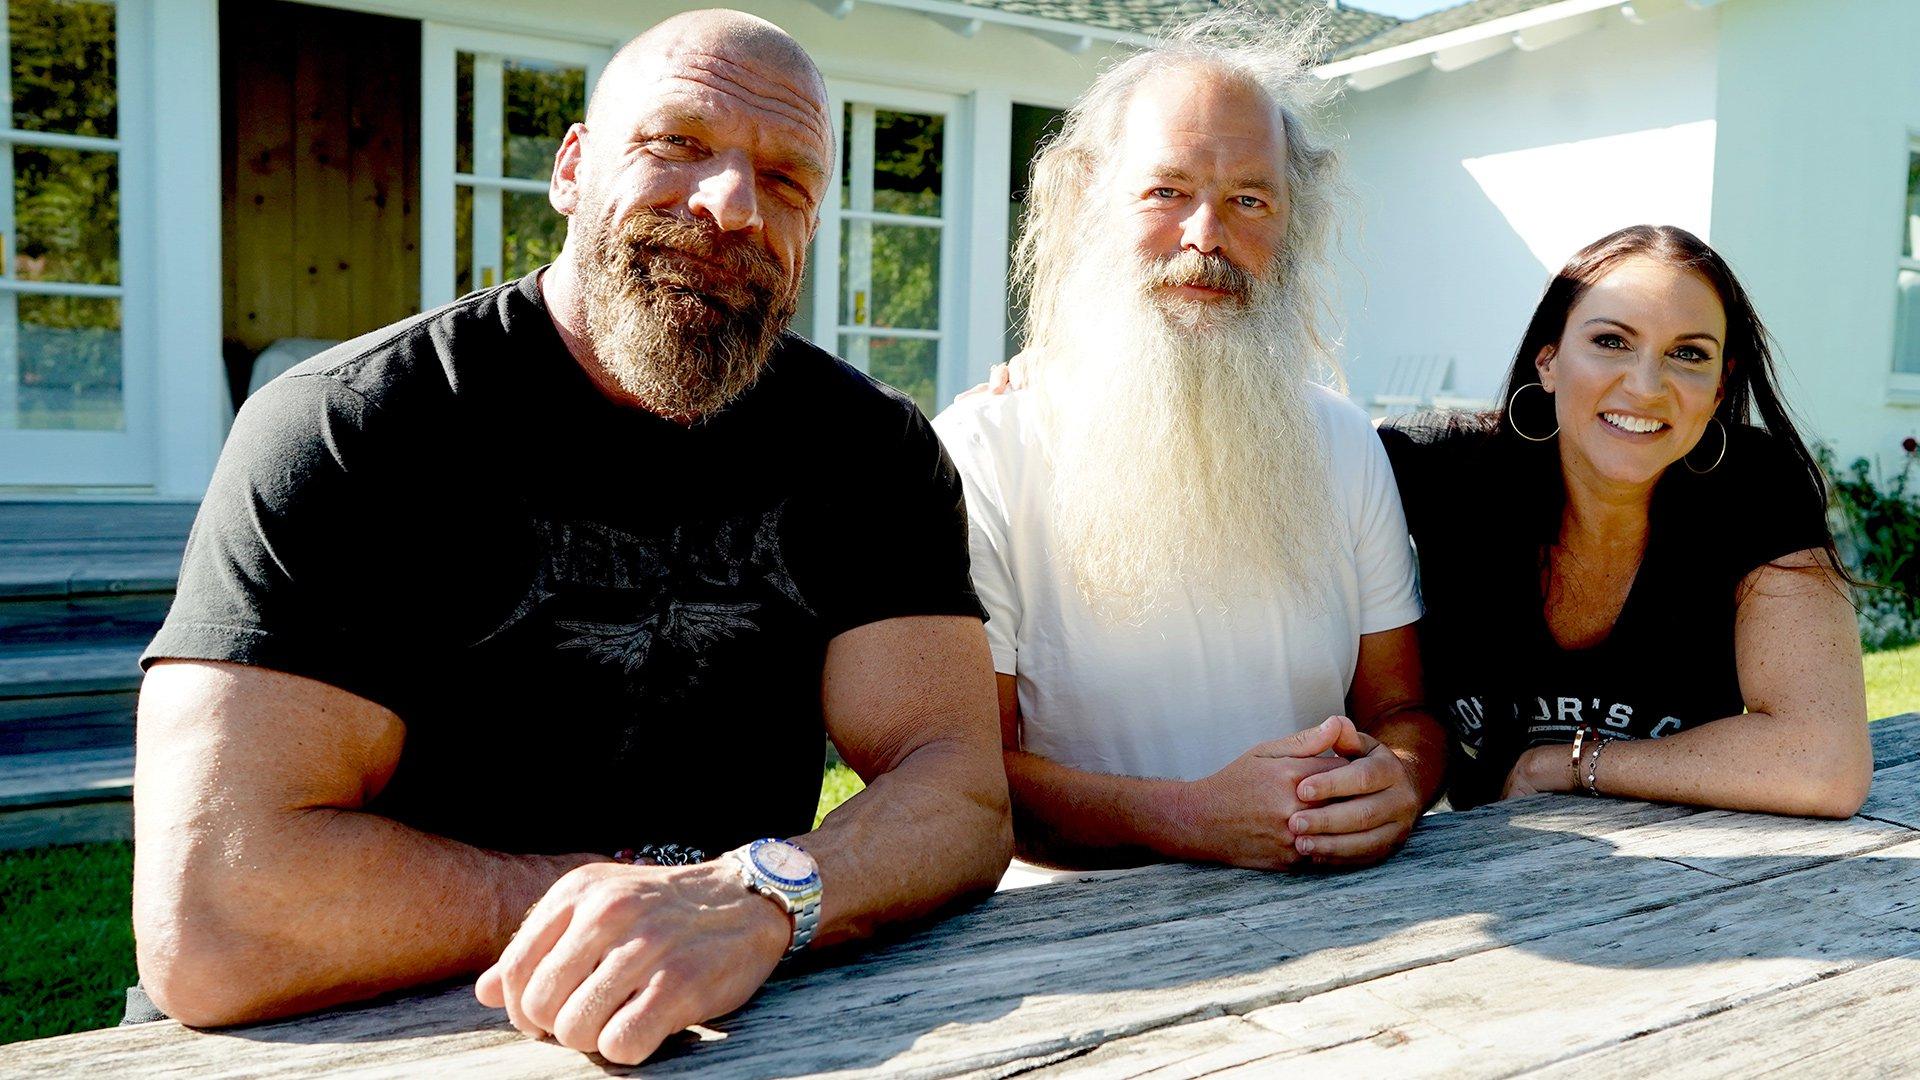 The Game rencontre l'icône de la musique Rick Rubin à Malibu: Triple H et sa Road to WrestleMania